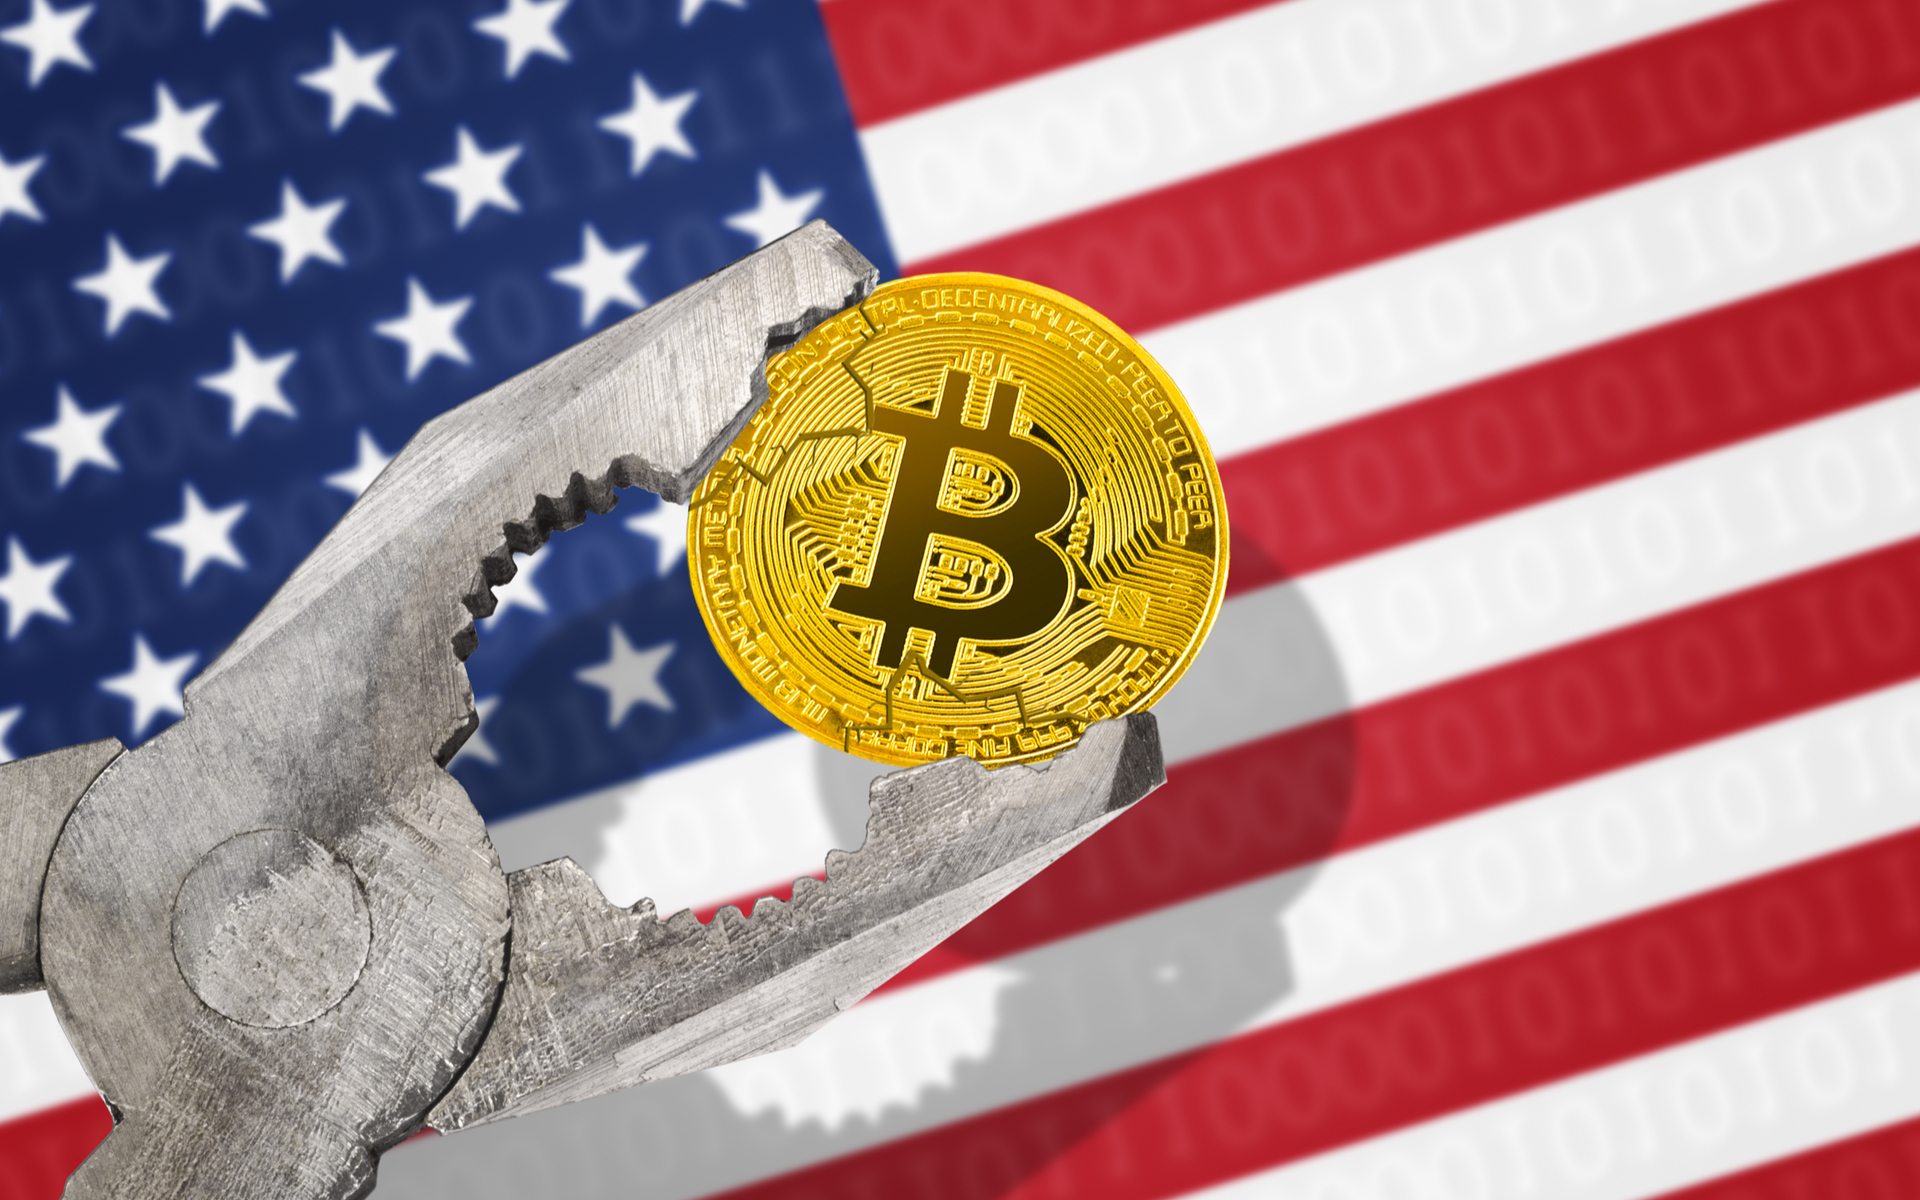 President Trump wants to ban bitcoin